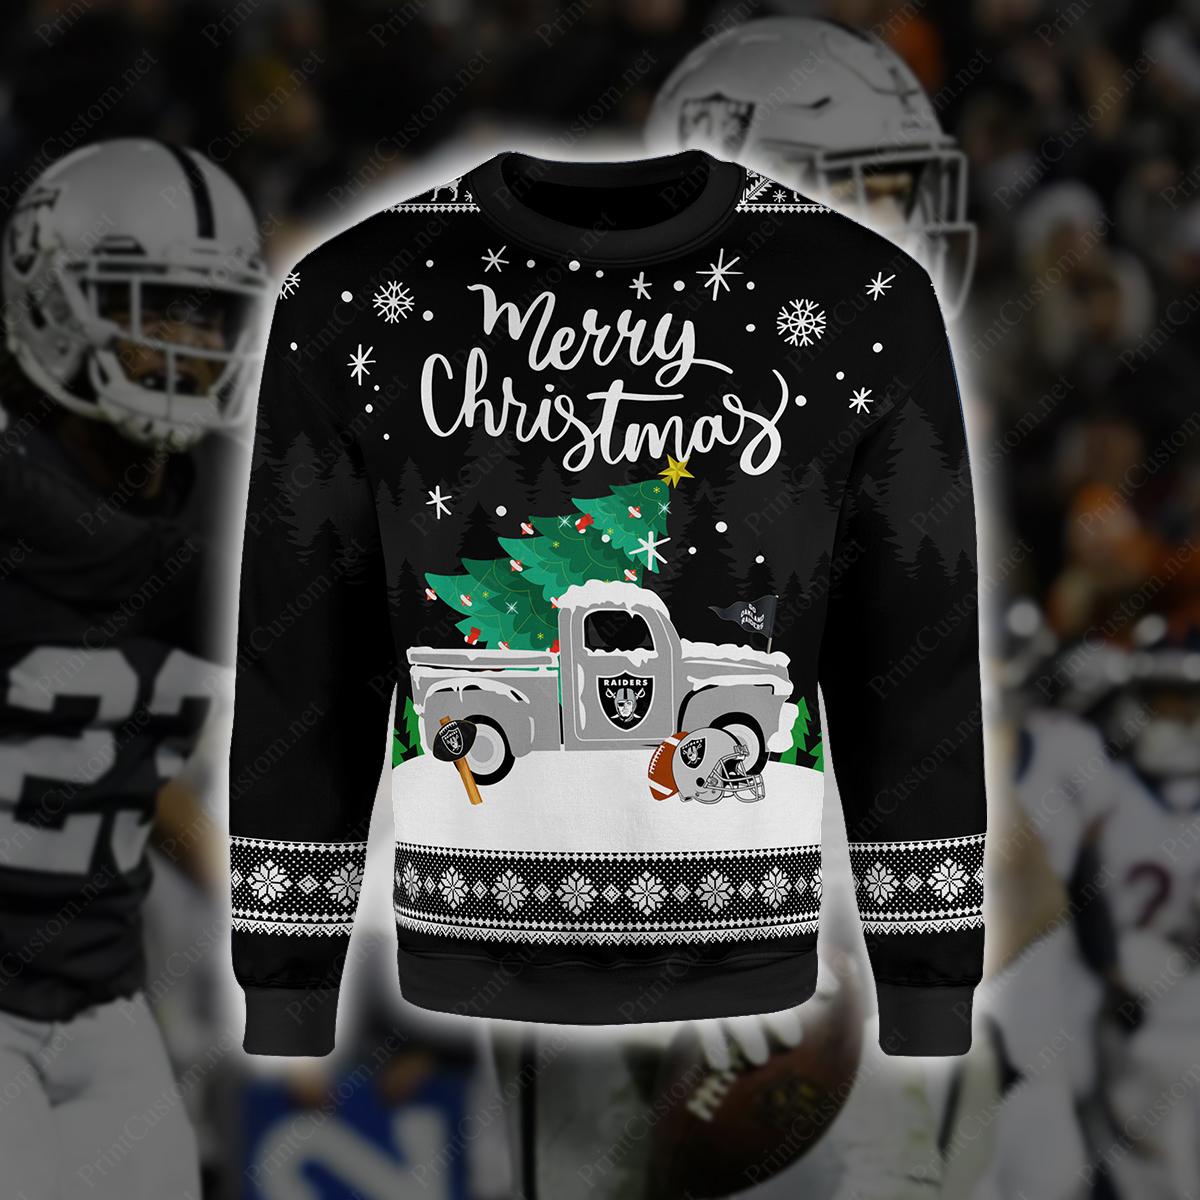 Merry christmas oakland raiders full printing shirt 2